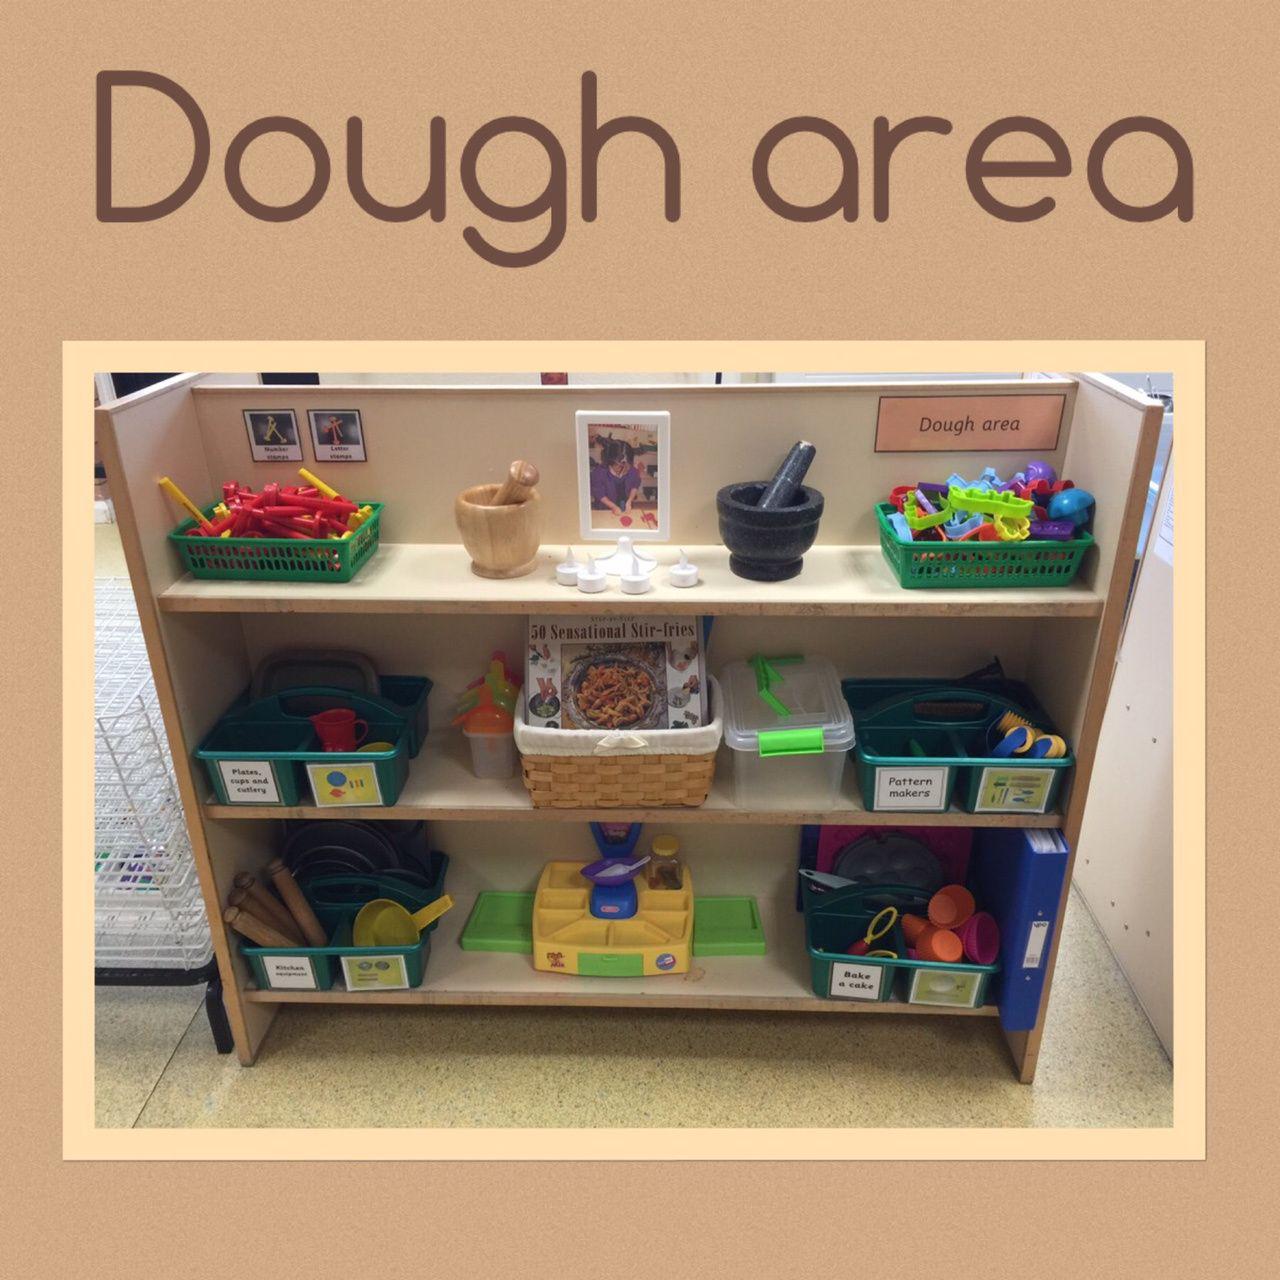 Classroom Design Ideas For Preschool: Dough Area Set-Up Idea (from Tishy Lishy)